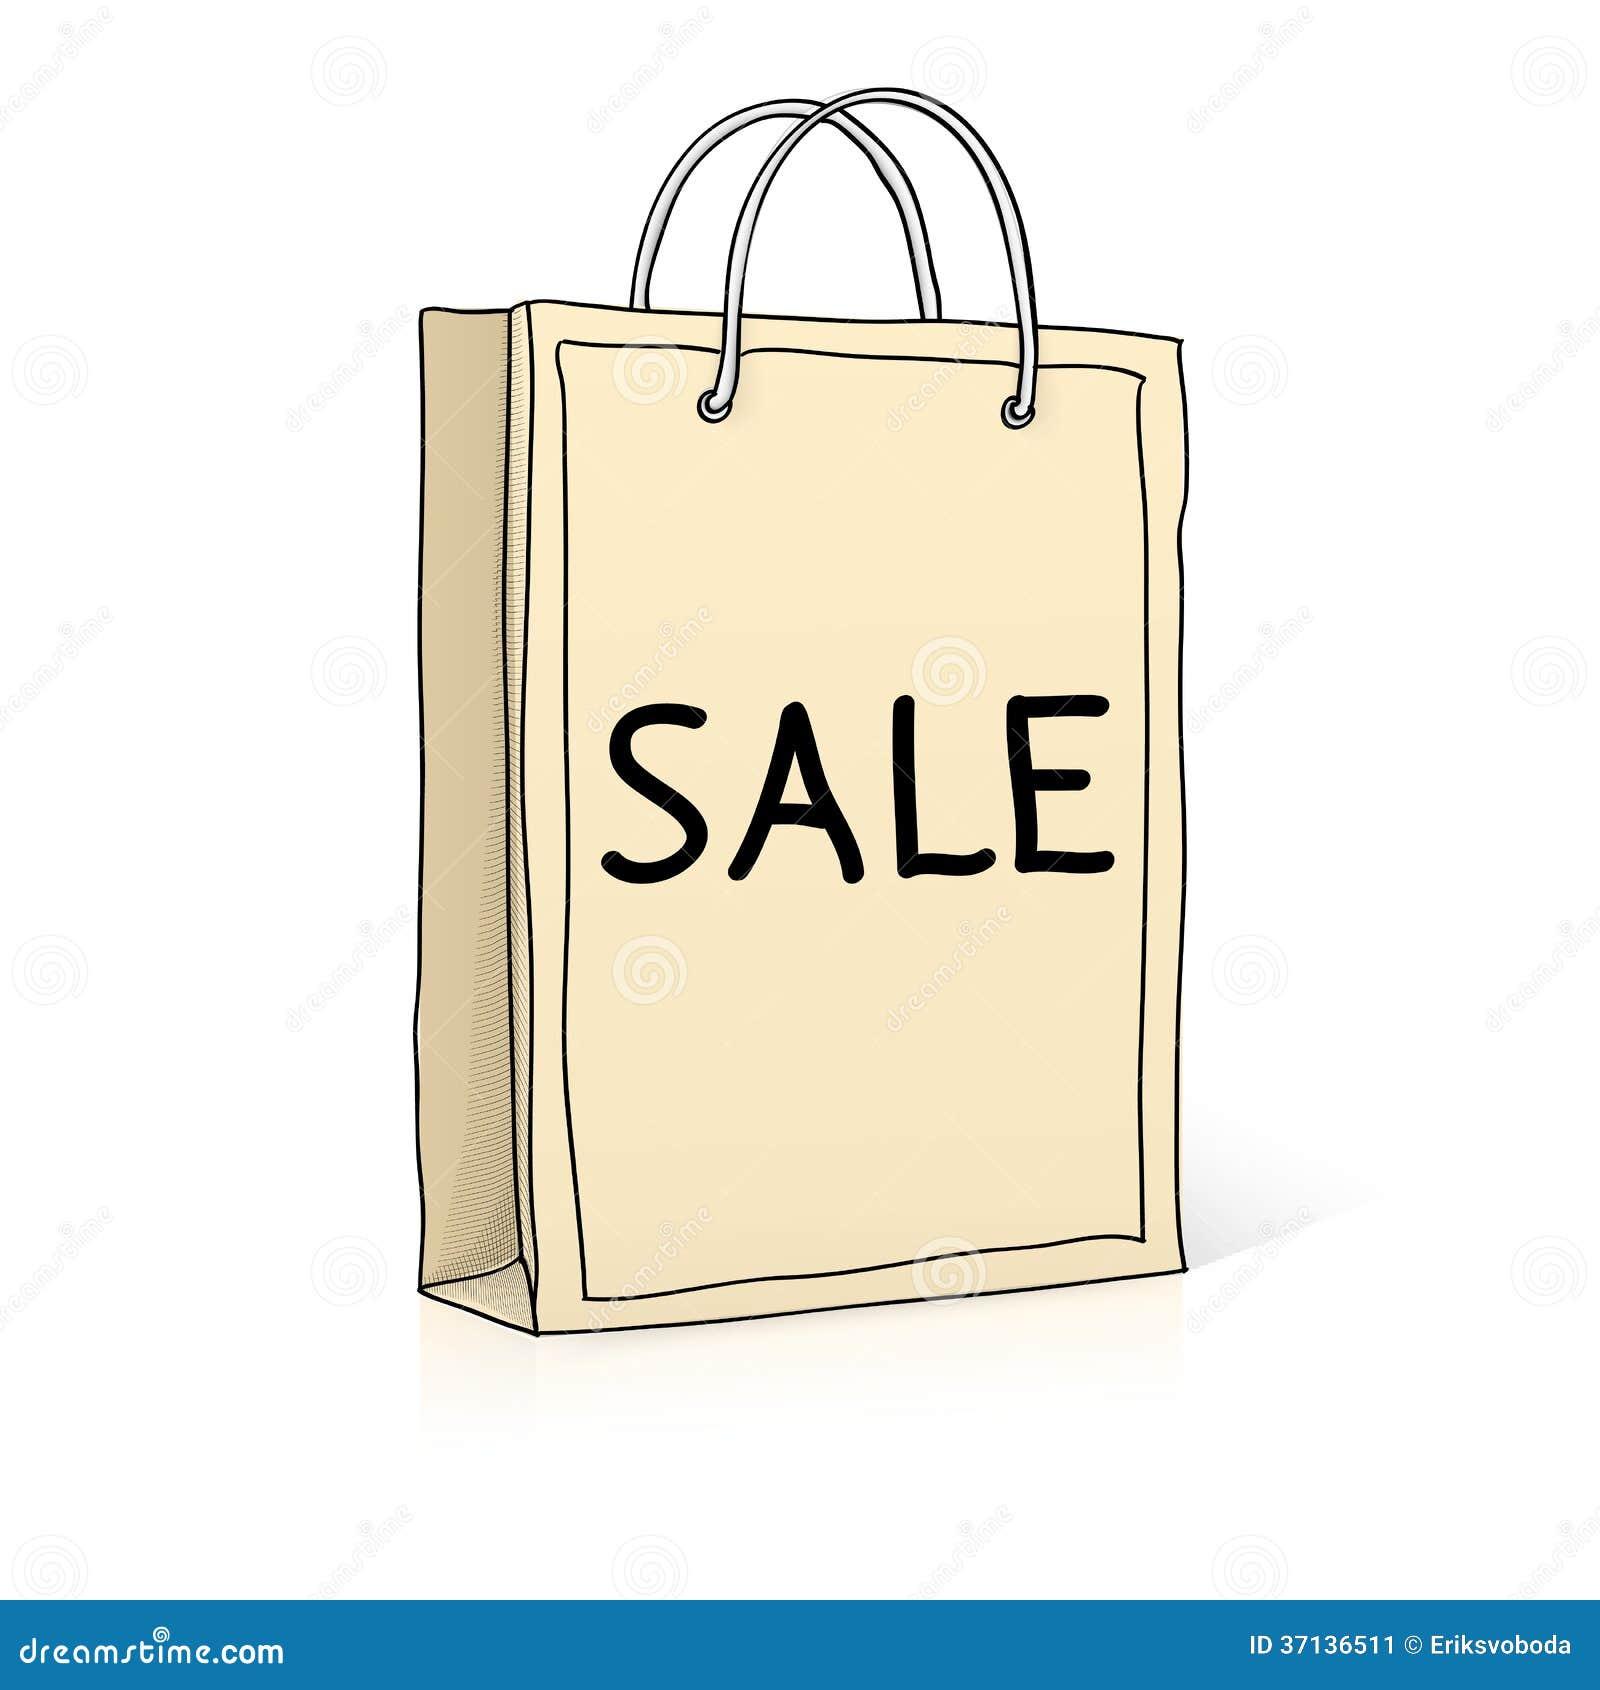 Paper bag sketch - Shopping